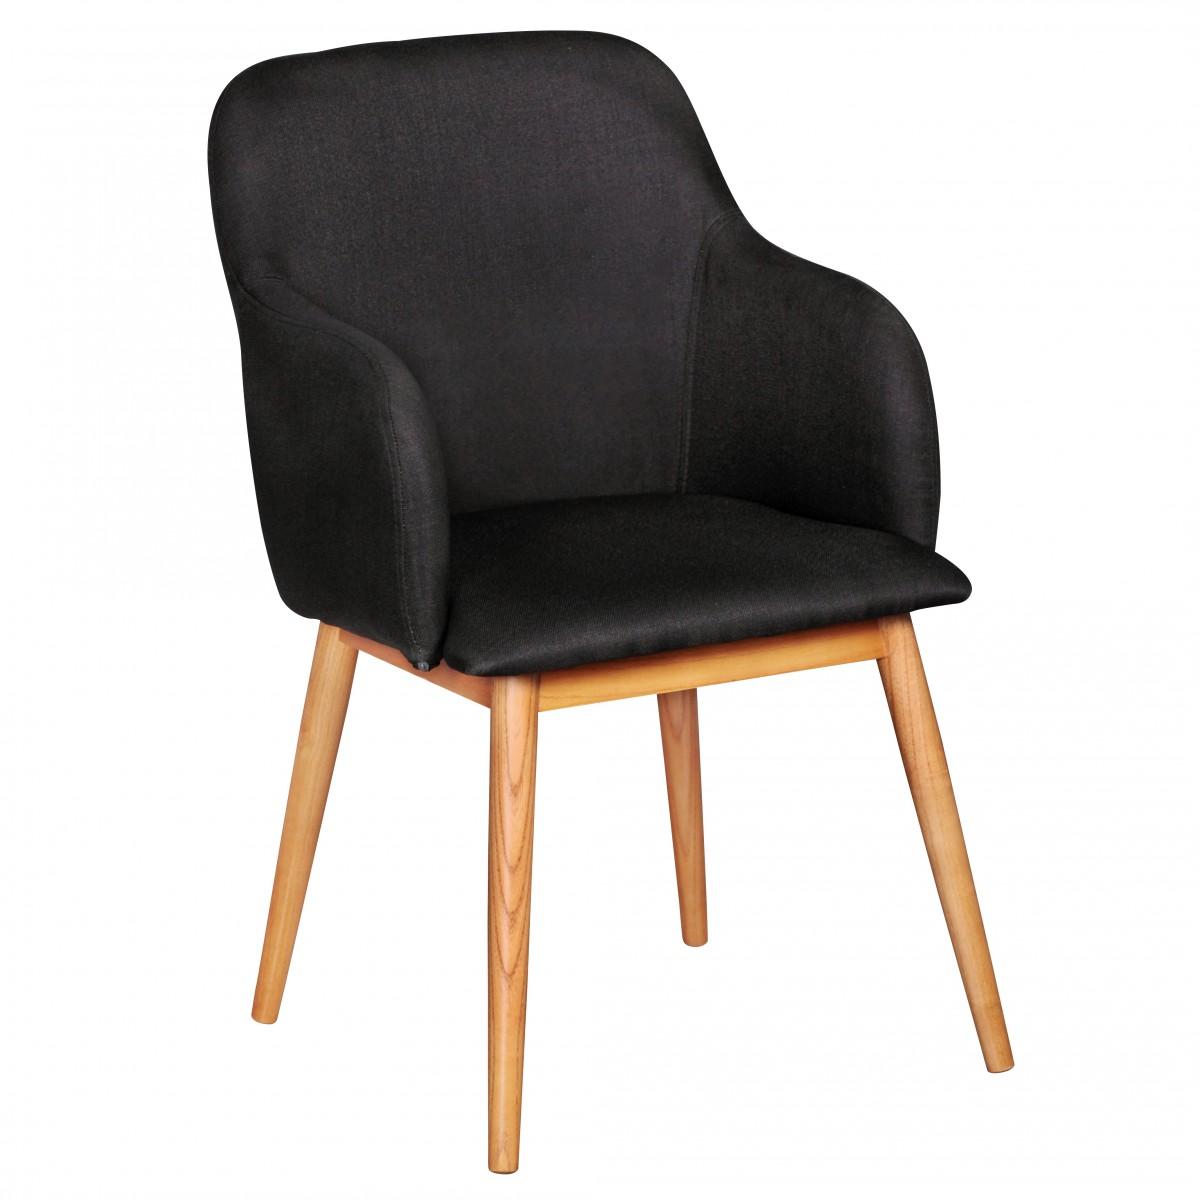 Finebuy silla de comedor retro silla tapizada silla - Sillas para cocina comedor ...